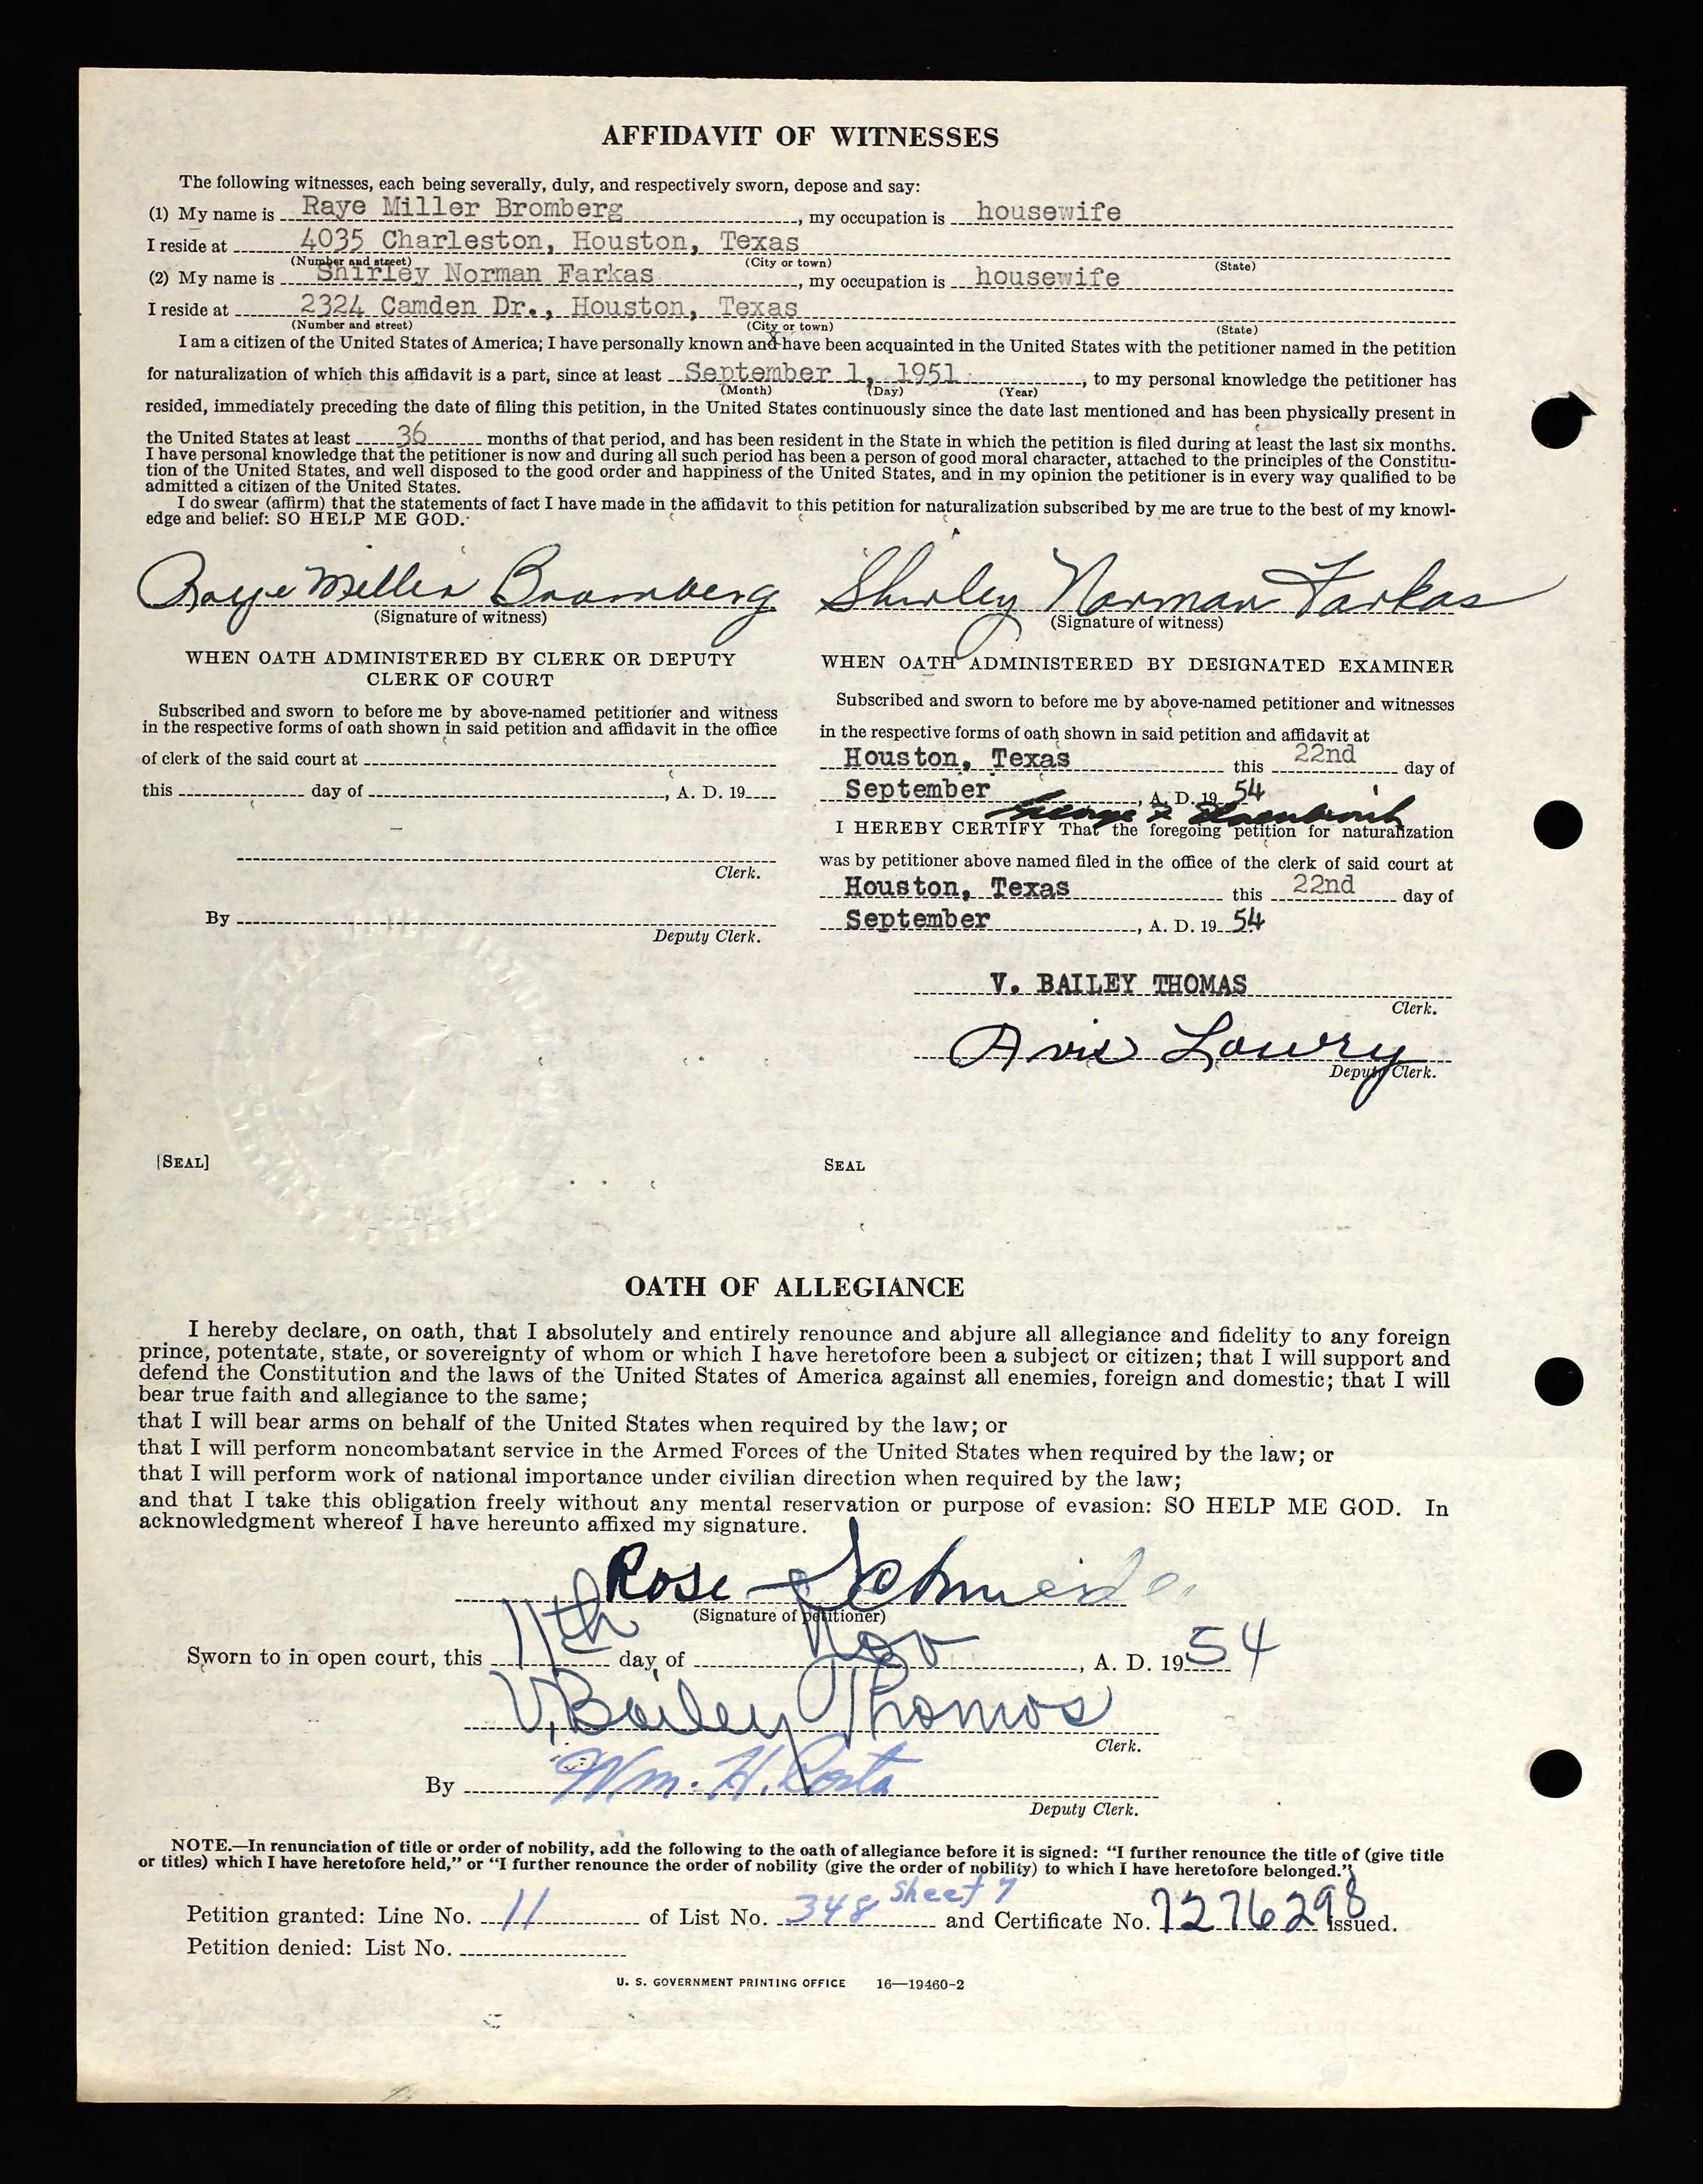 Texas Naturalization Records 1881 1992 Name Rifke Blum Schneider Rose Schneider Pg 2 Sheet Music